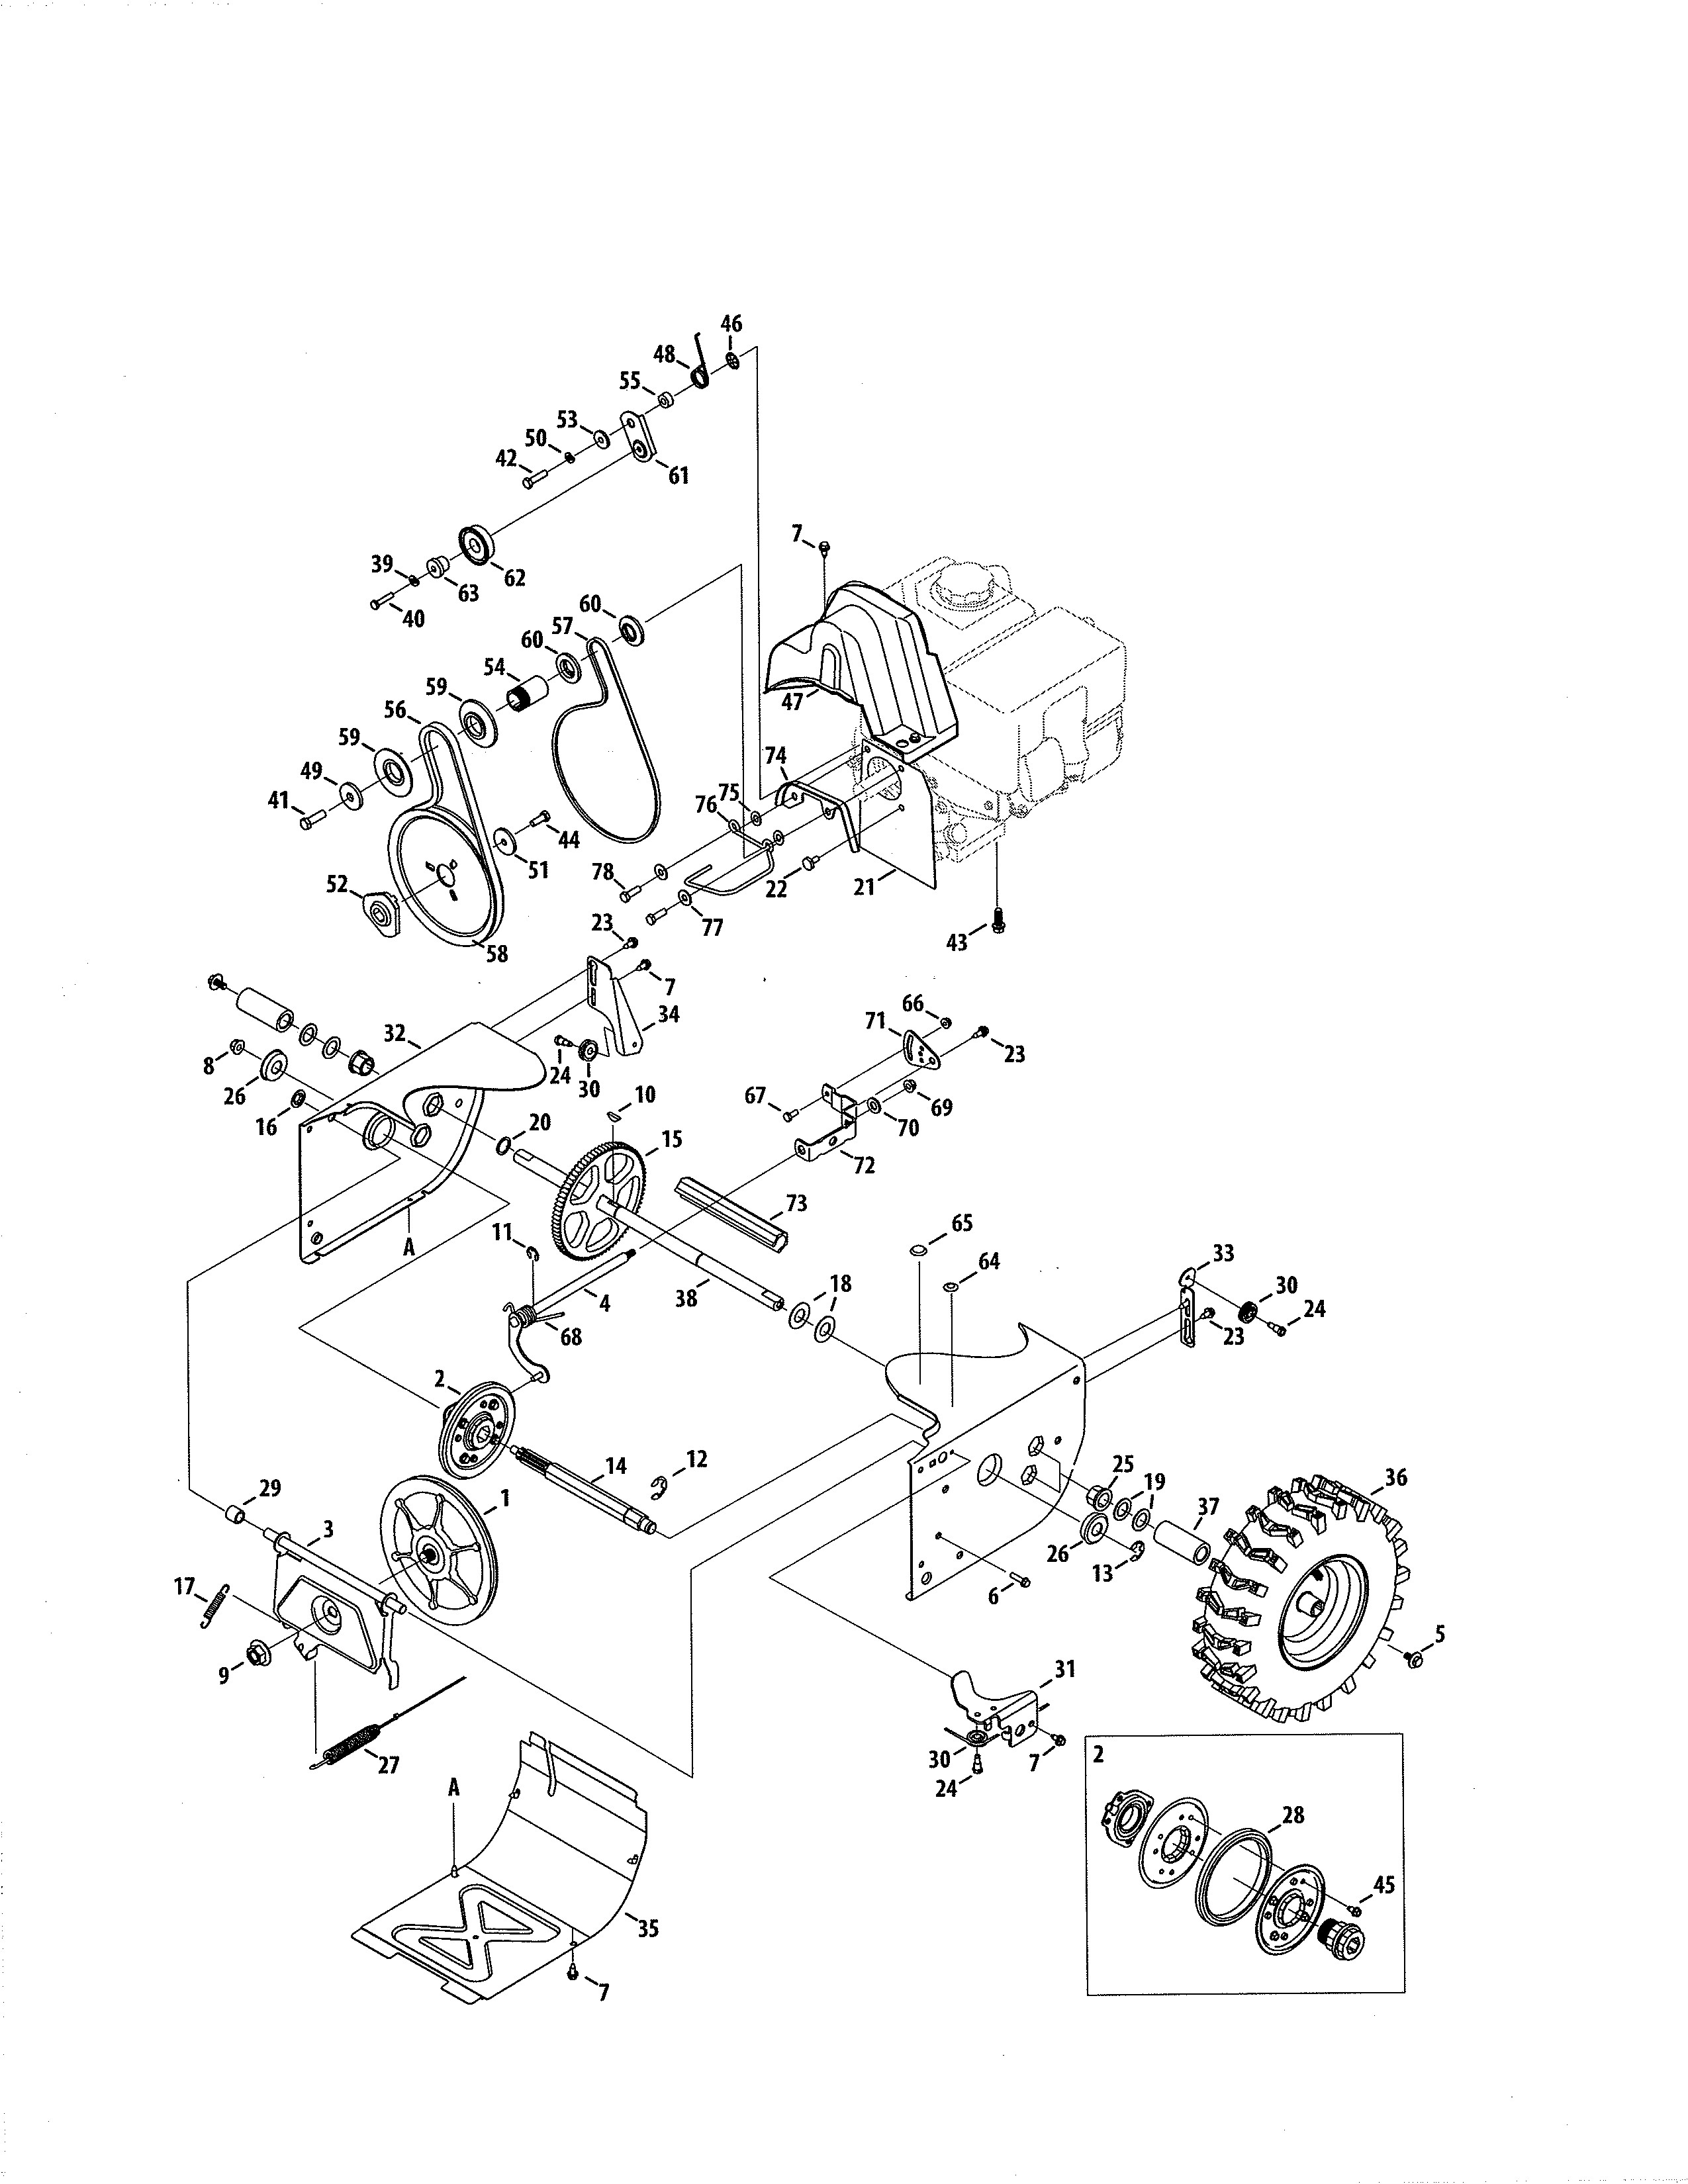 Craftsman Leaf Blower Parts Diagram My Wiring Diagram